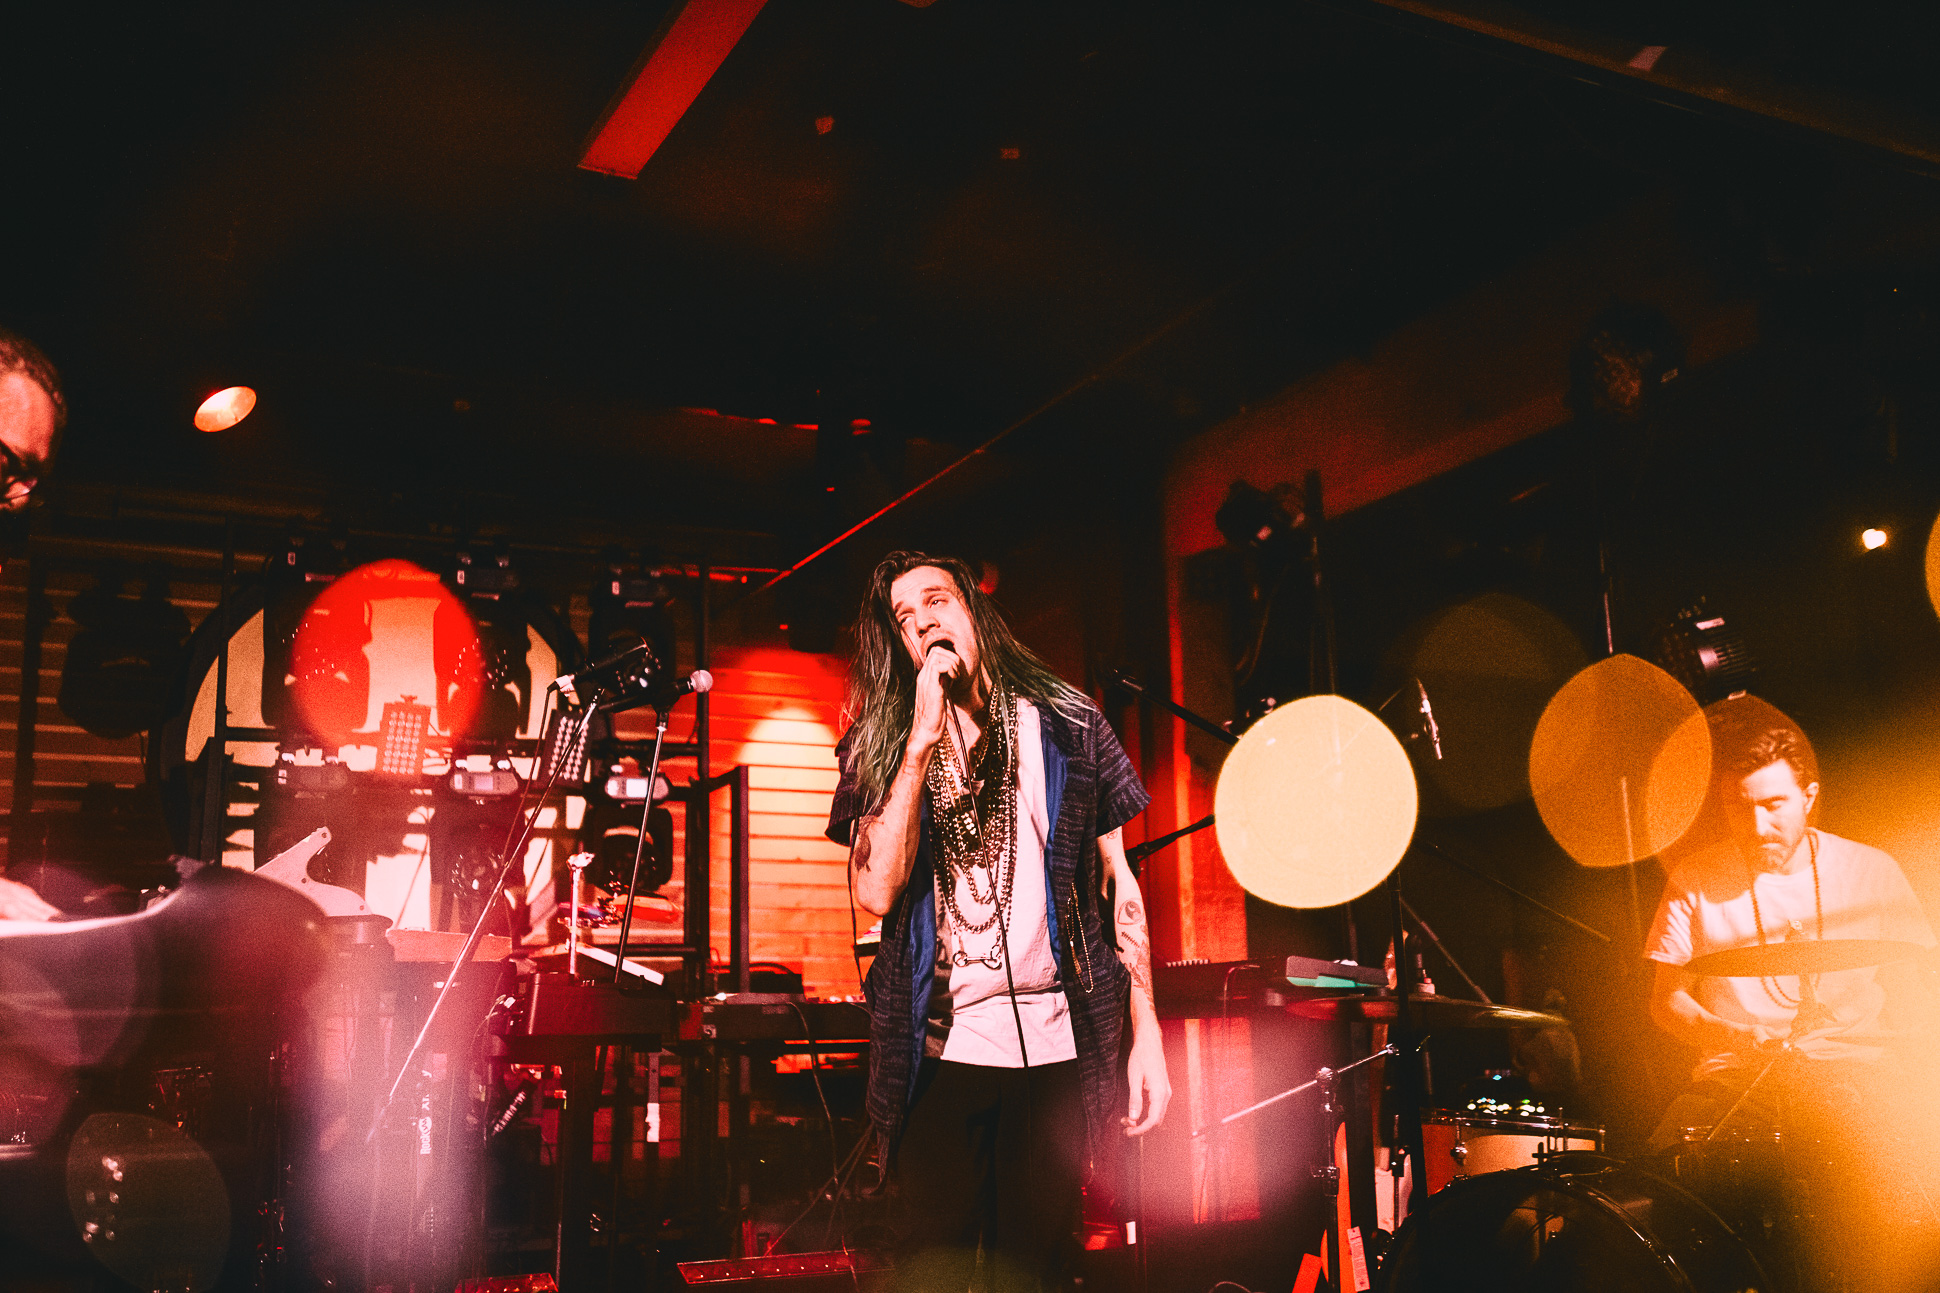 YoungAndSick-FortuneSoundClub-24-01-2019-Vancouver-17.jpg